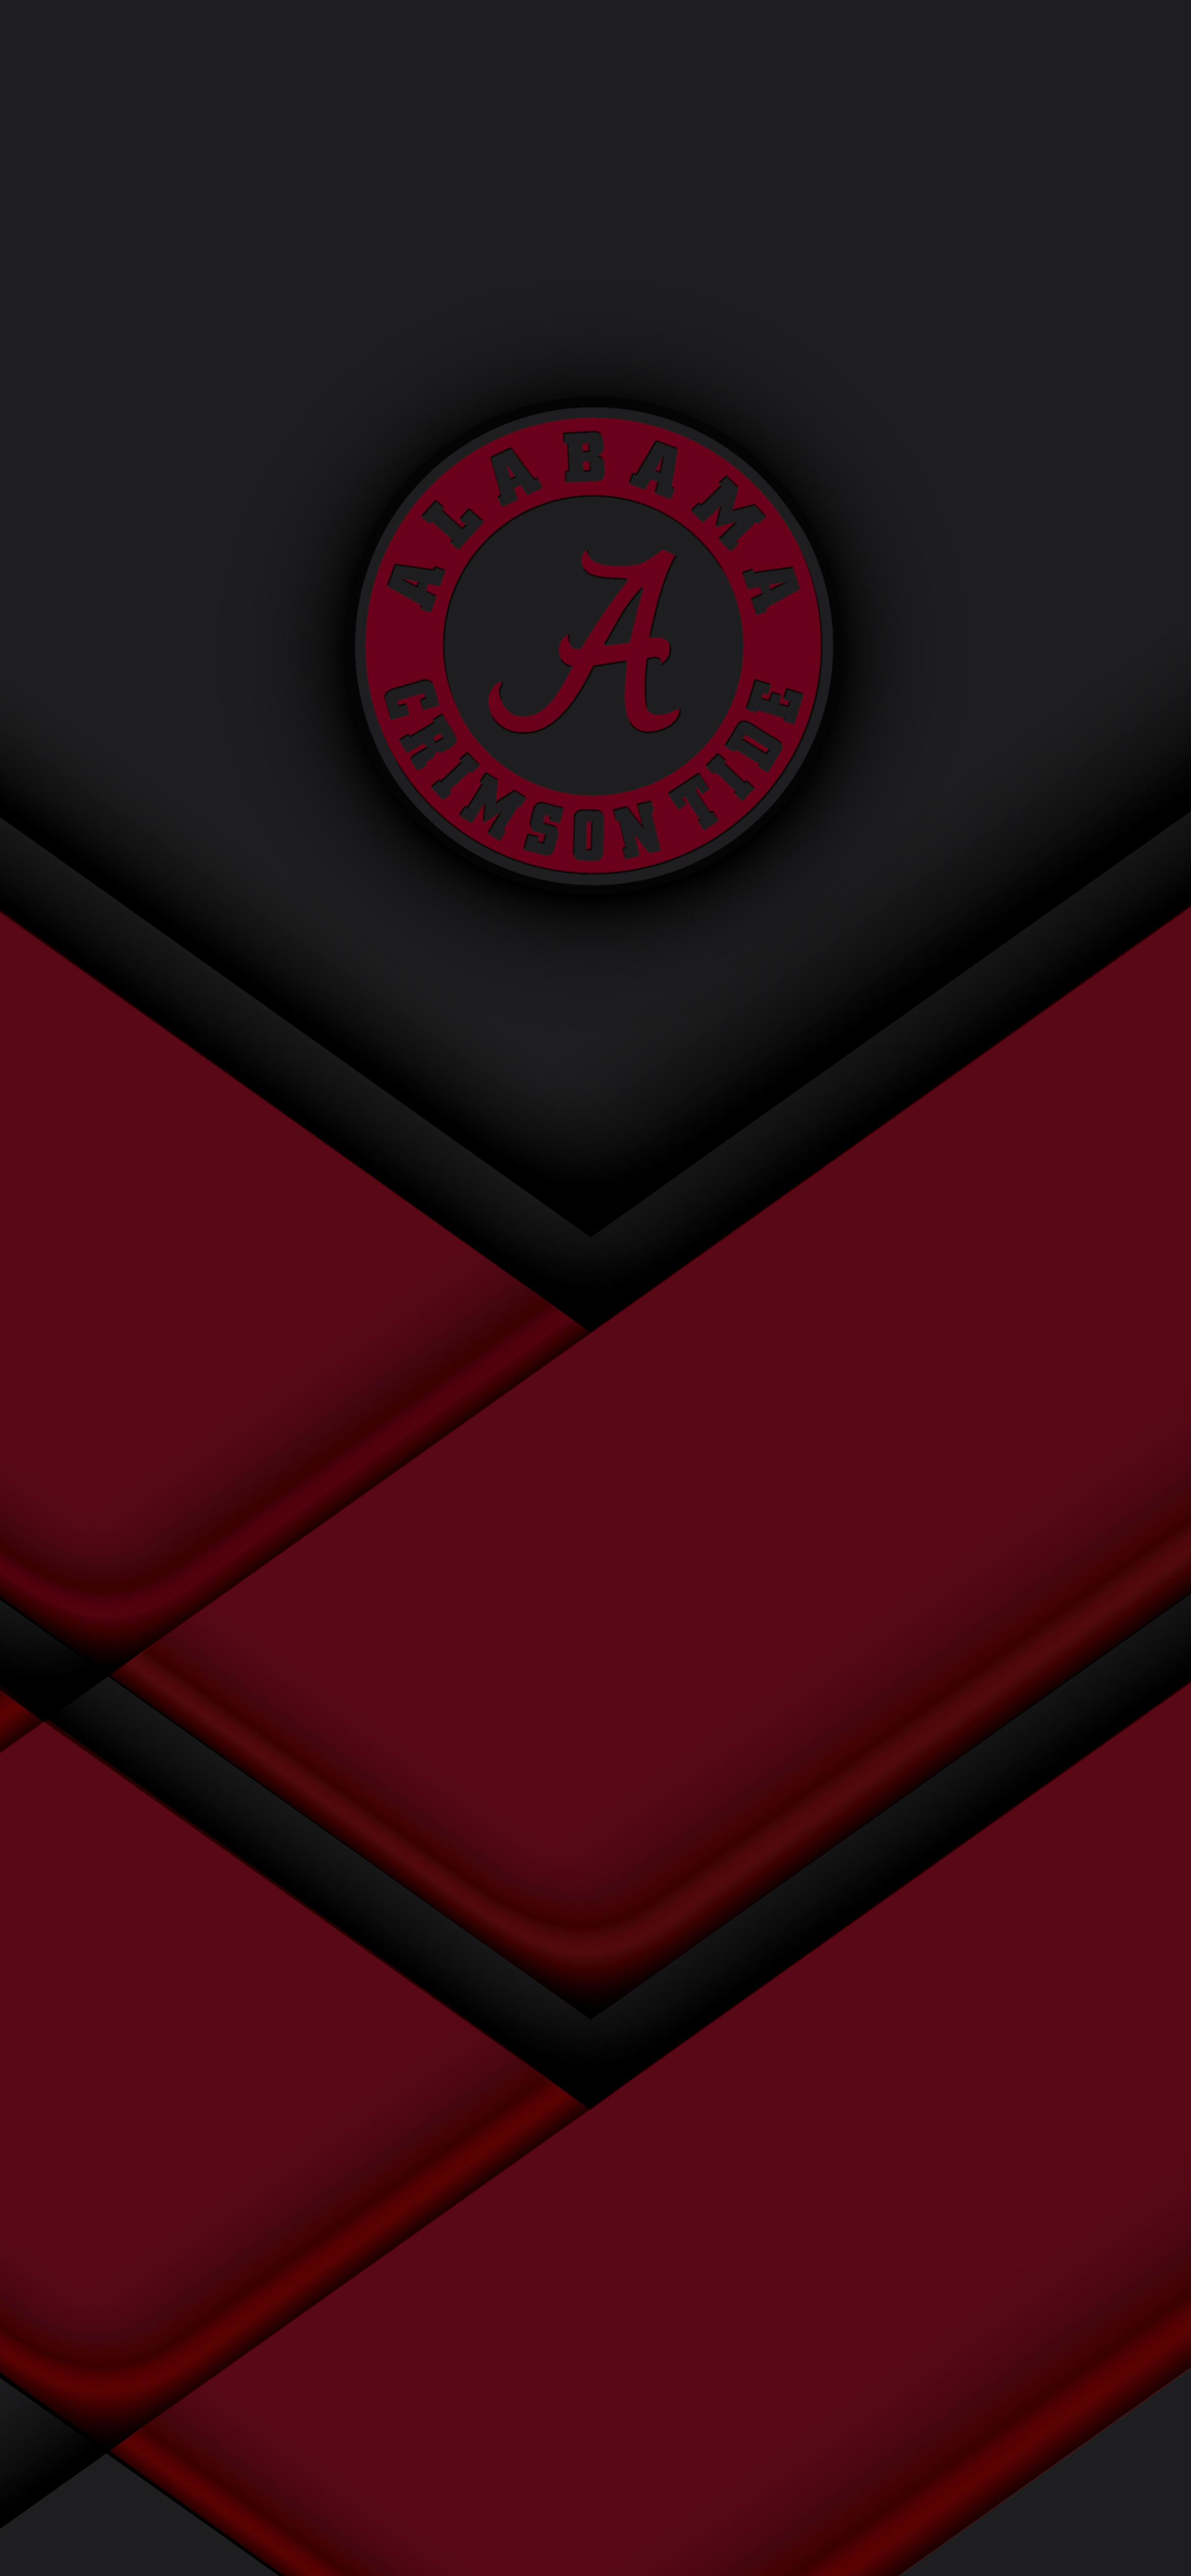 Modern 7 Alabama Crimson Tide Football Wallpaper Alabama Crimson Tide Crimson Tide Football